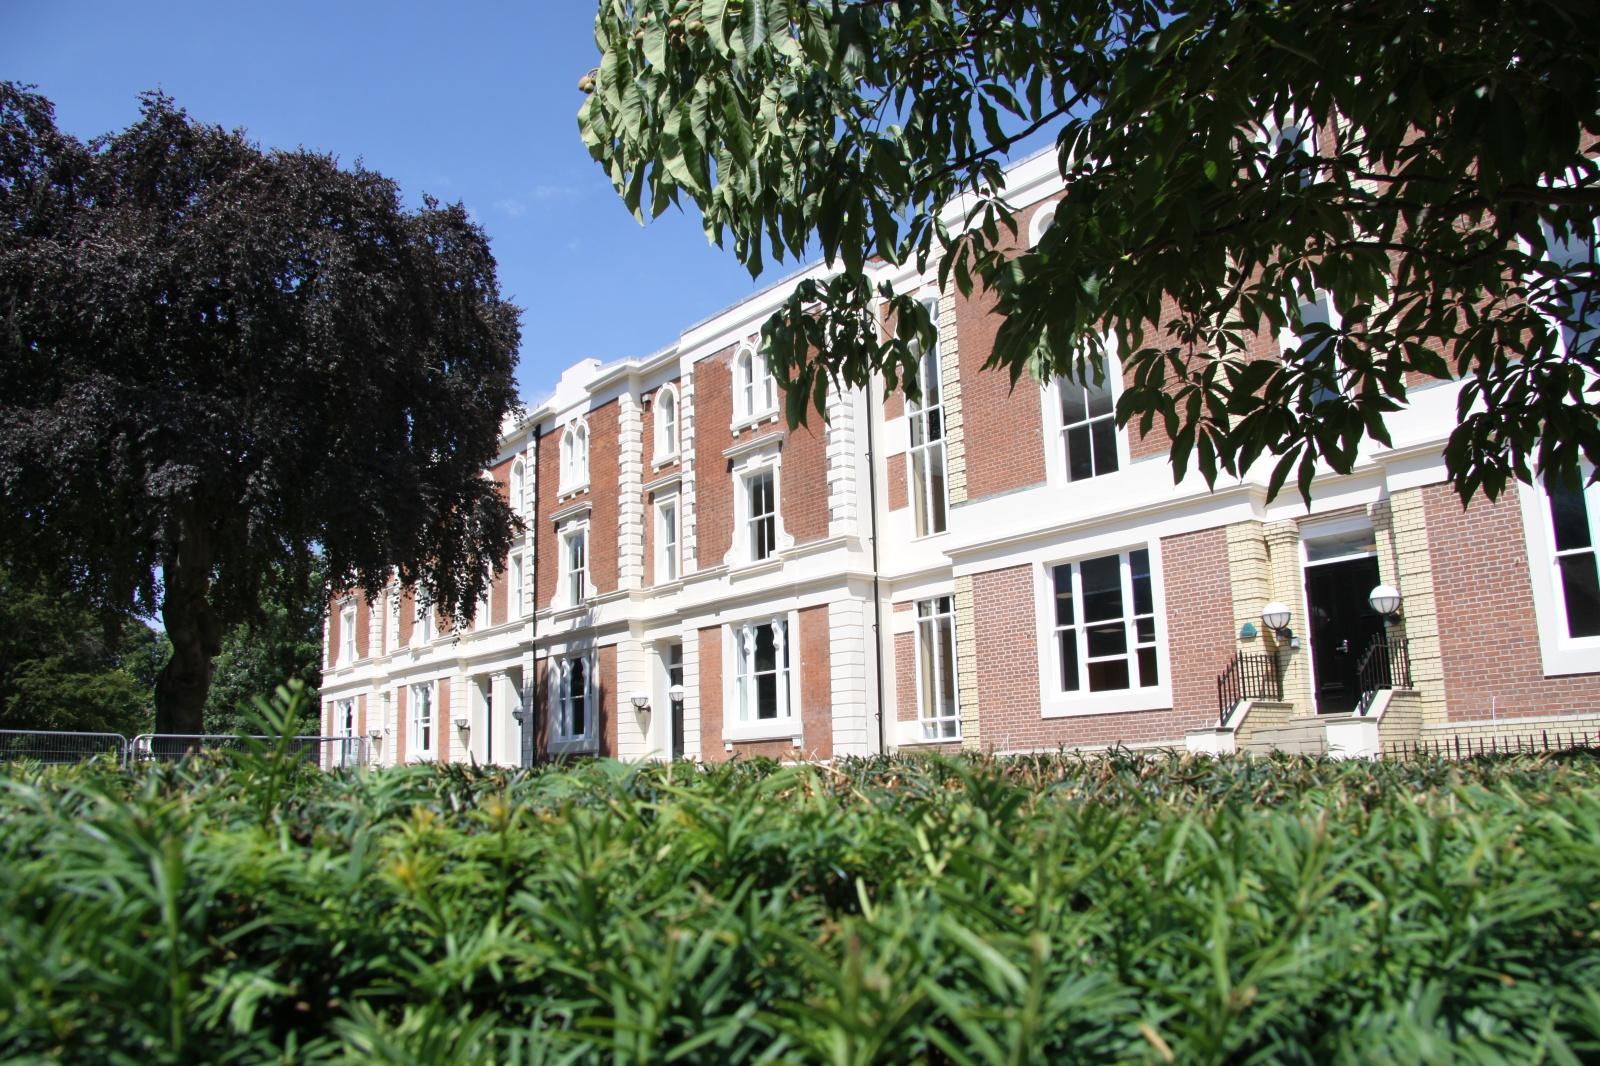 Deansgate, 62-70 Tettenhall Road, Wolverhampton, West Midlands